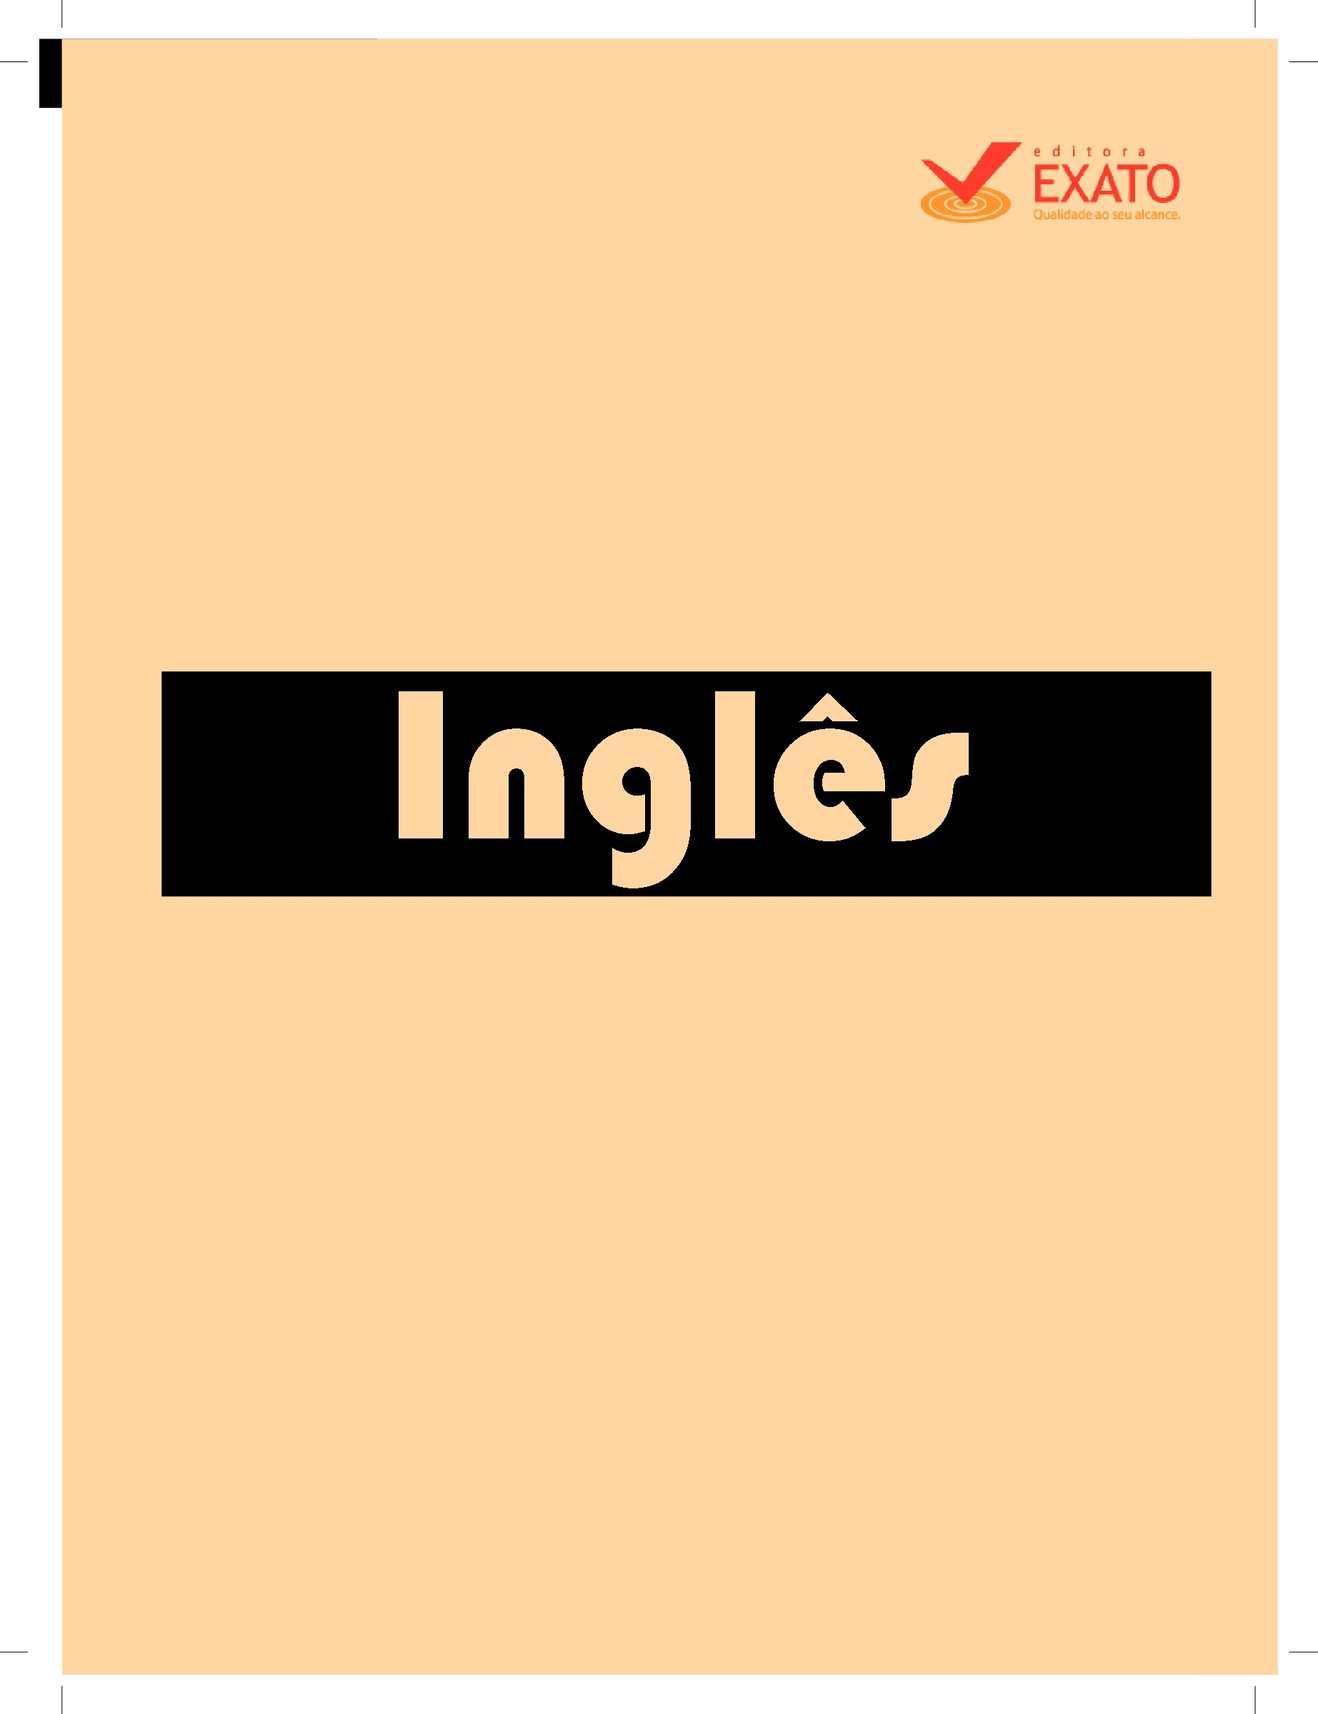 0de3dbd8a36 Calaméo - Apostila de línguas 2010 Inglês